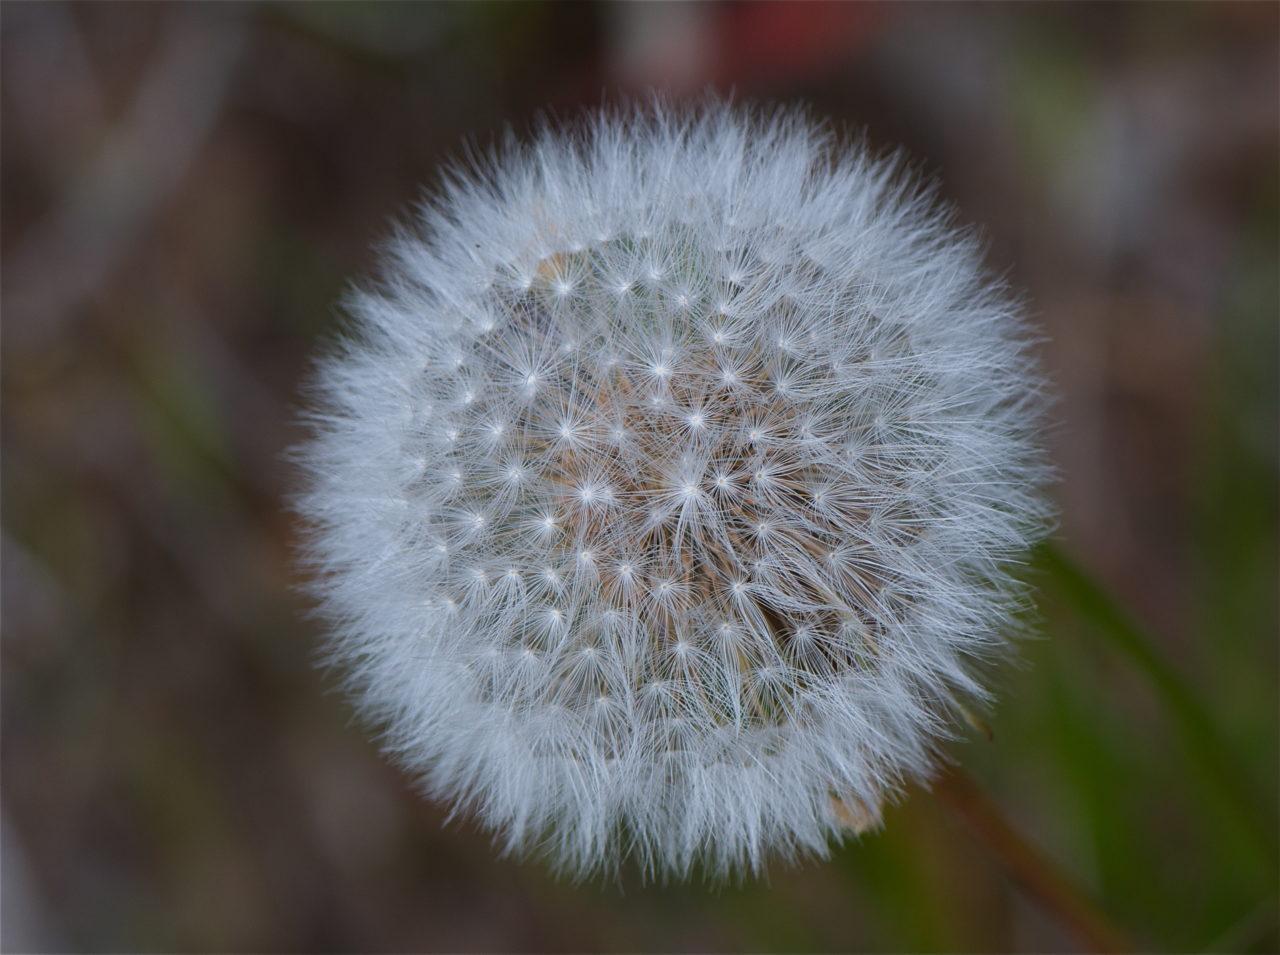 Red-seeded dandelion